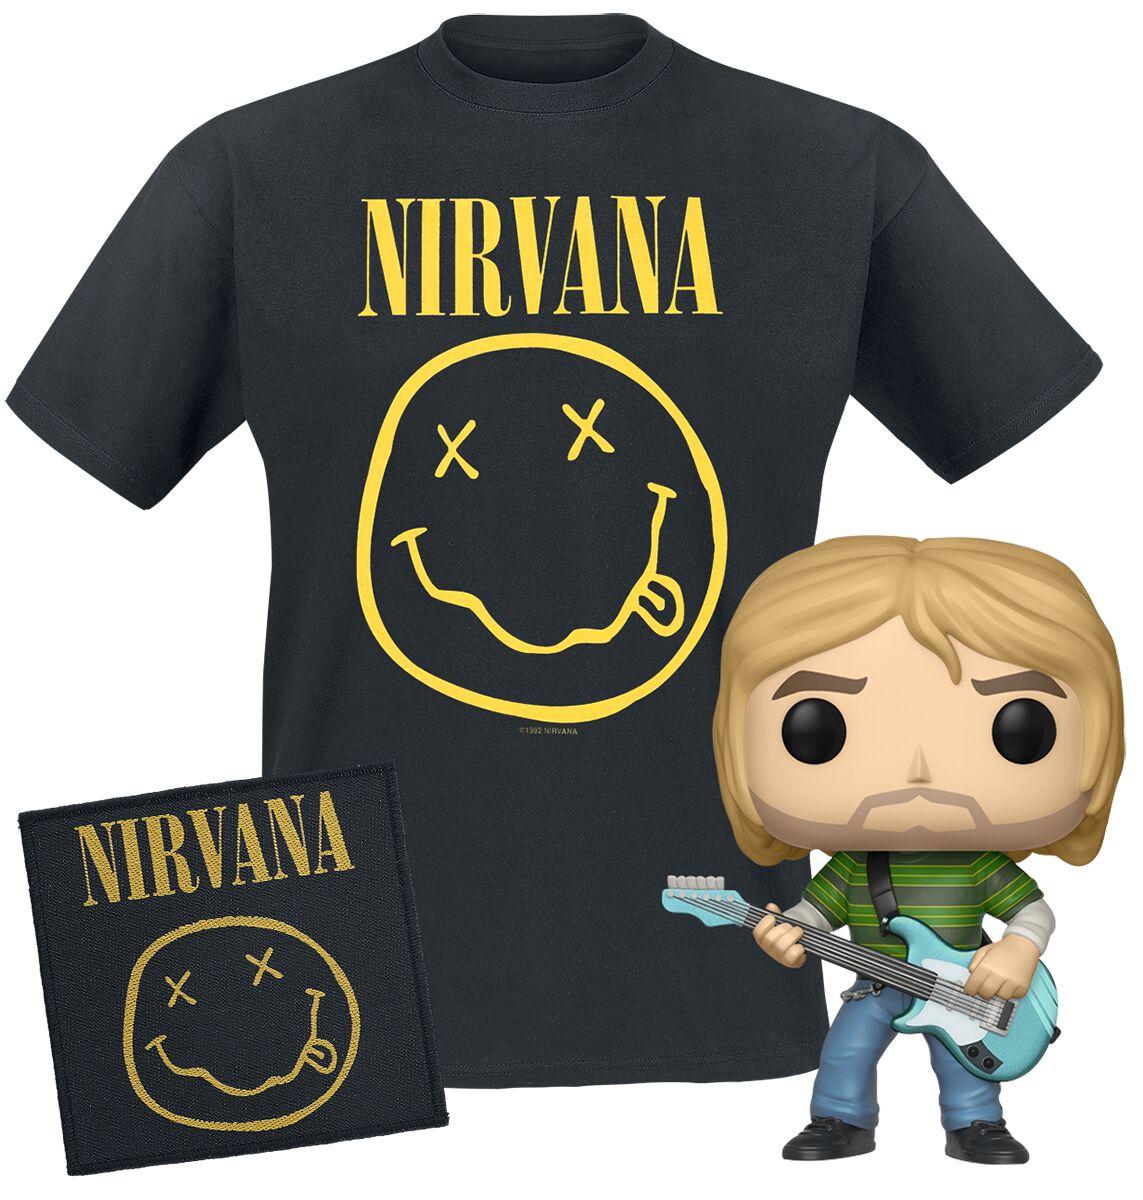 Nirvana Nirvana Bundle T-Shirt & Funko & Patch ...